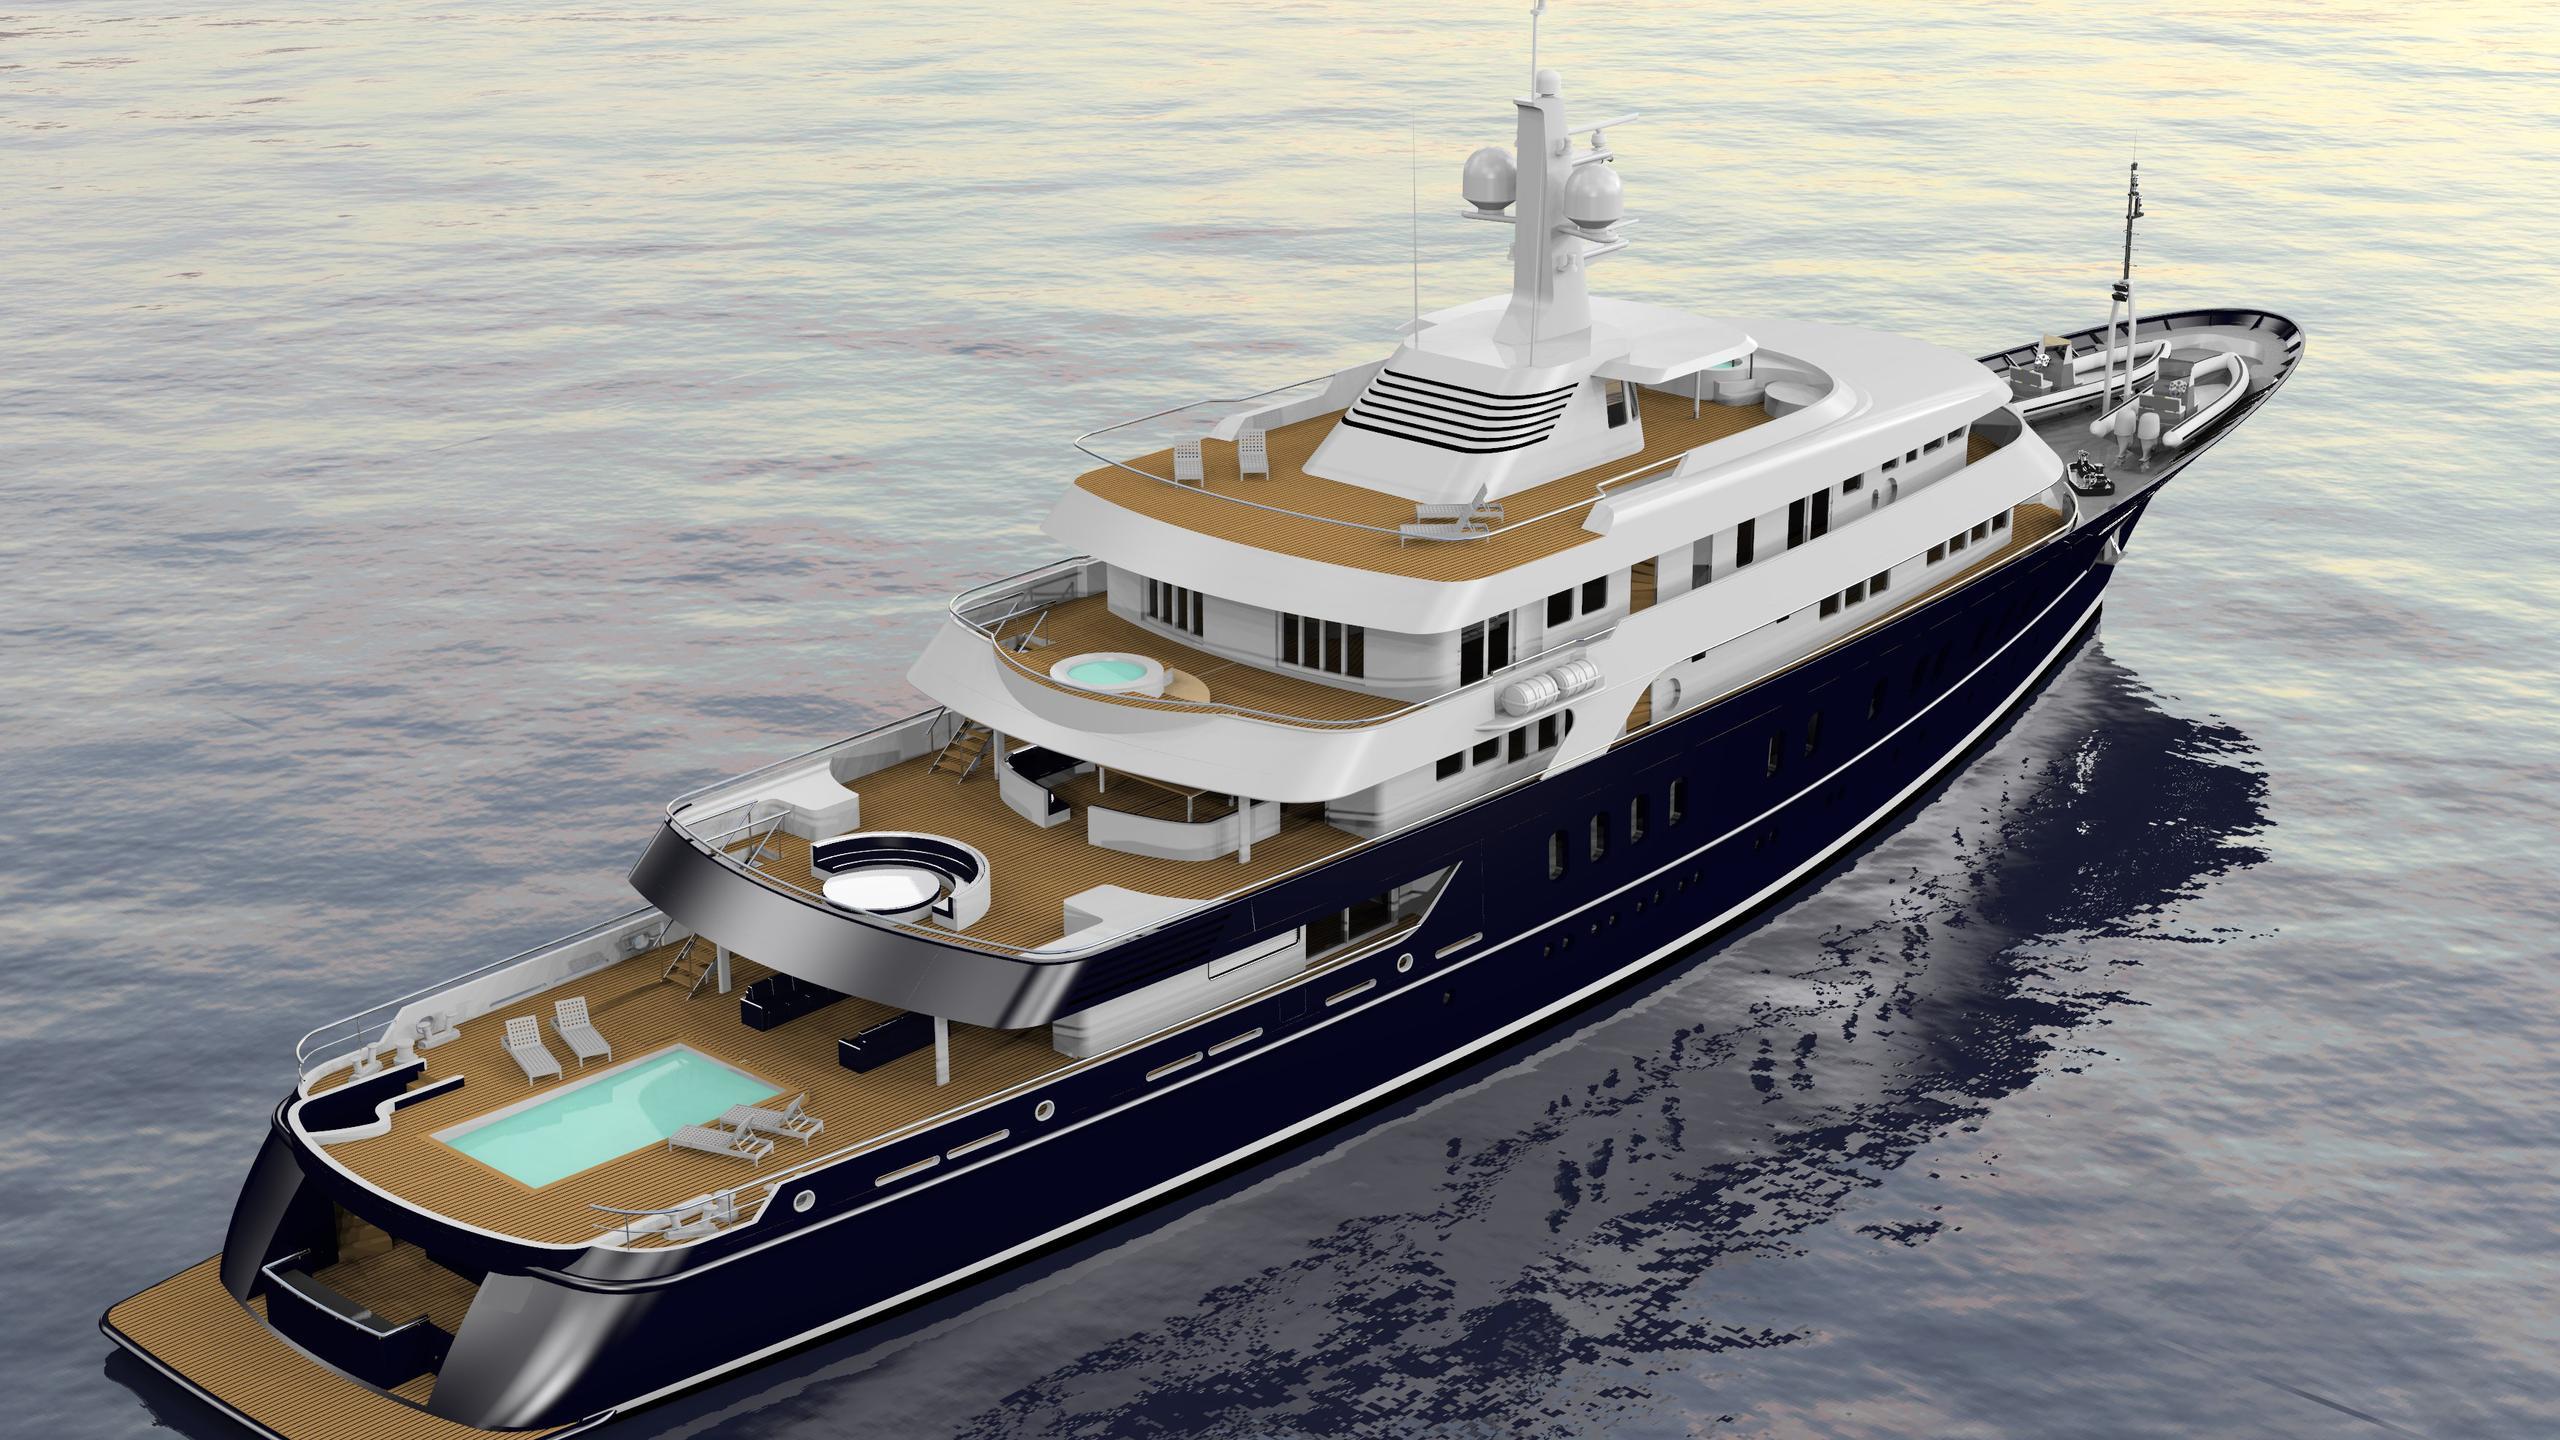 grand seraglio motoryacht akship 82m 2019 rendering half stern